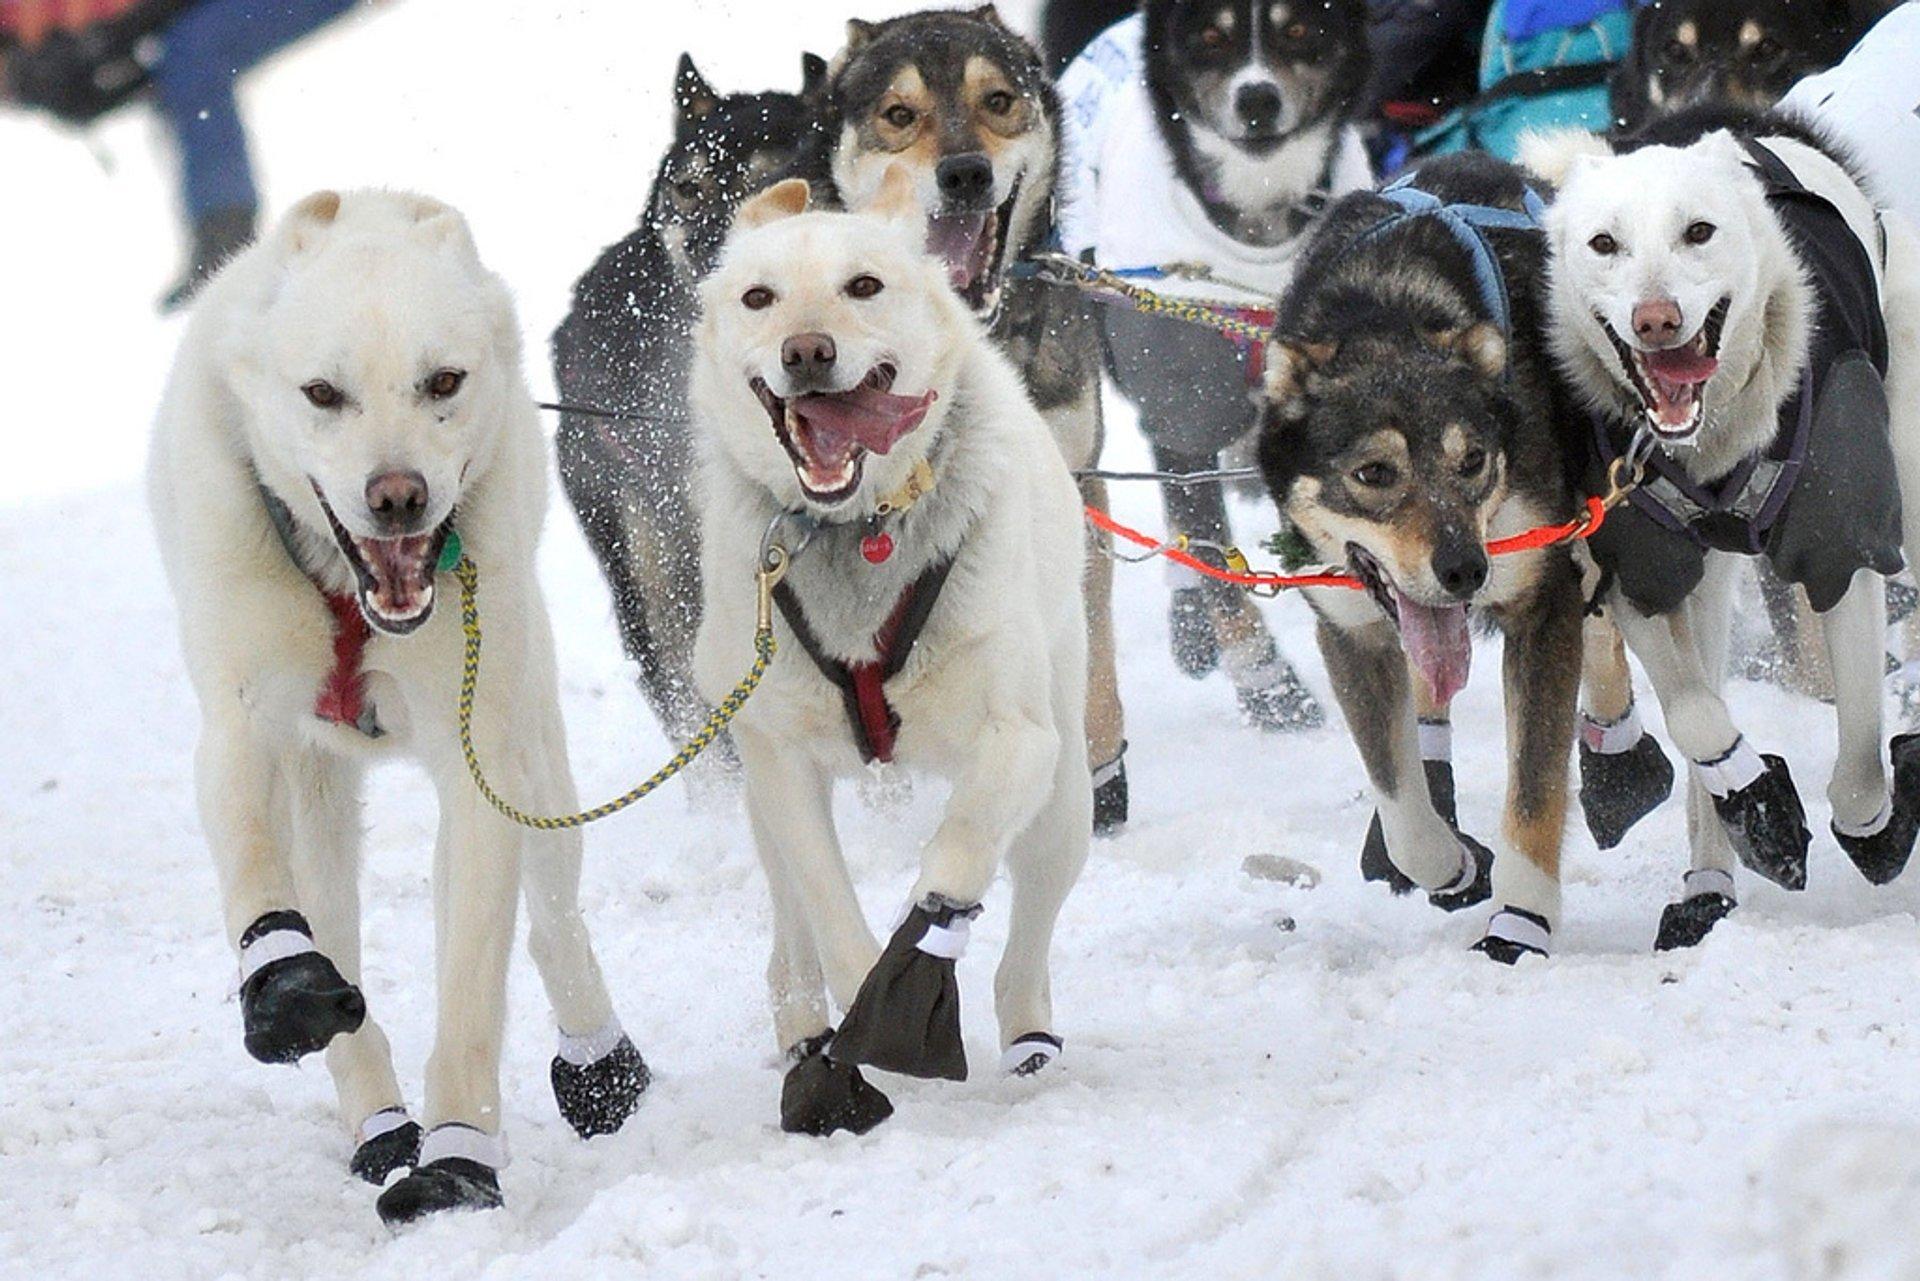 Iditarod Trail Sled Dog Race in Alaska 2020 - Best Time